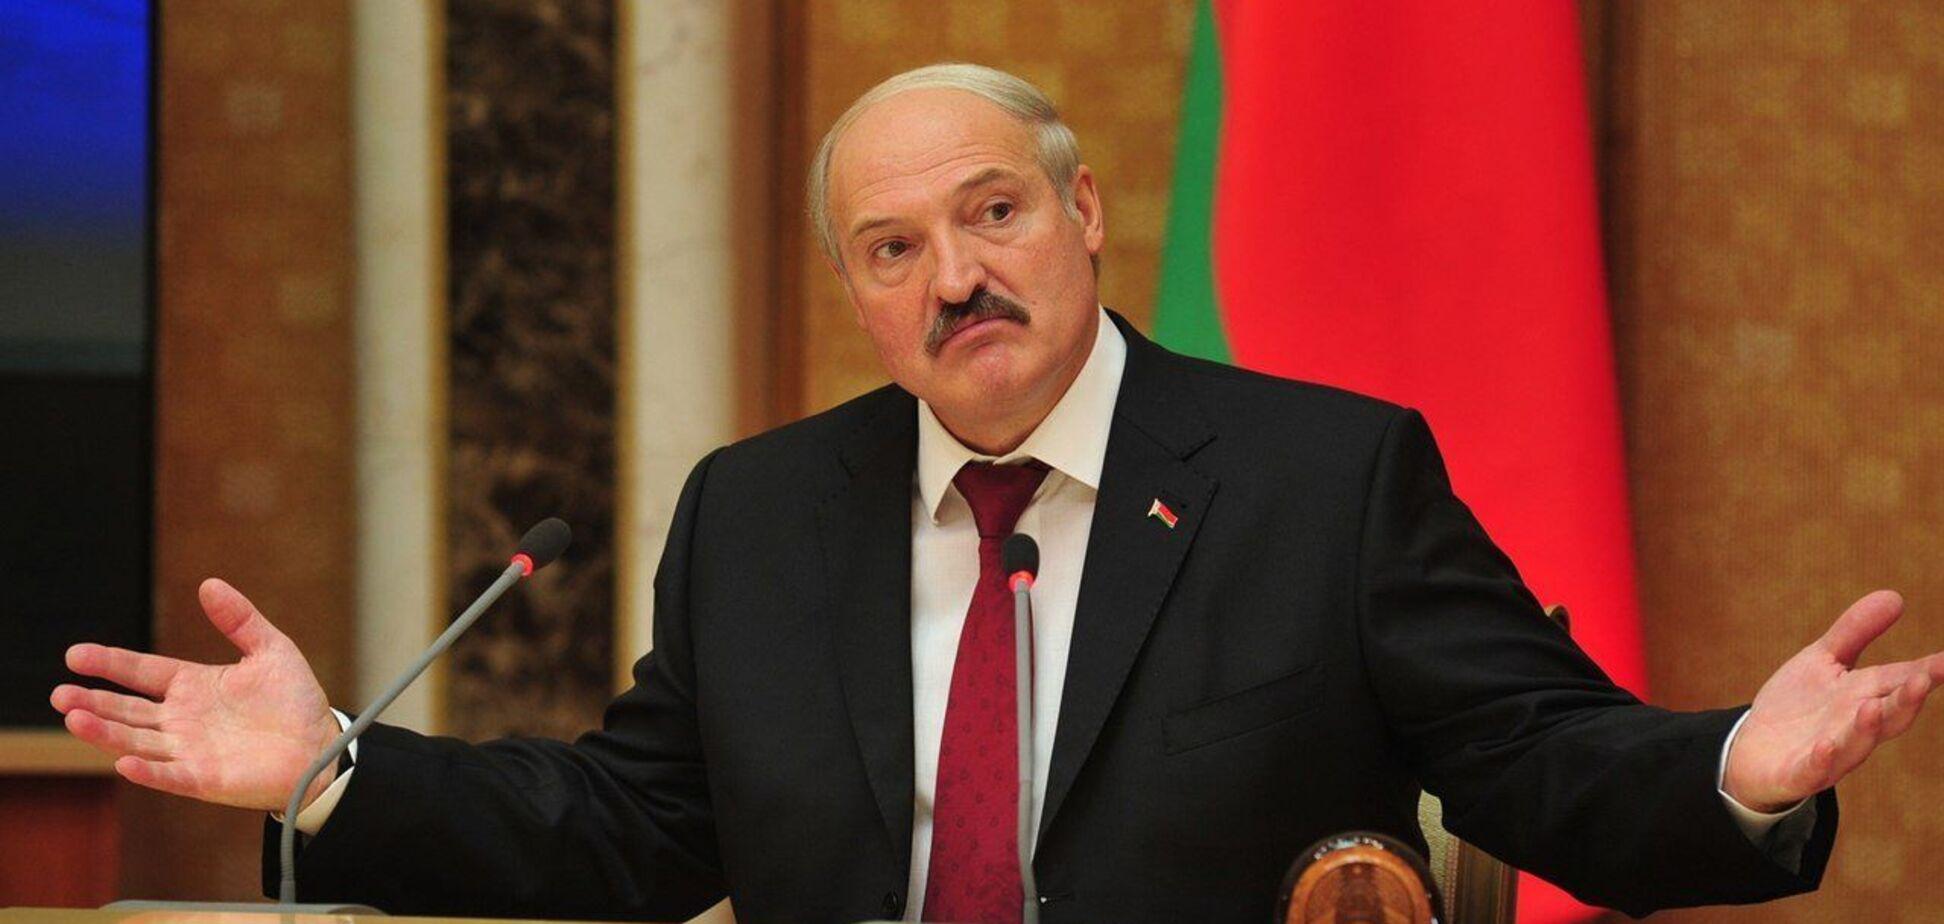 Самоназванный президент Беларуси Александр Лукашенко